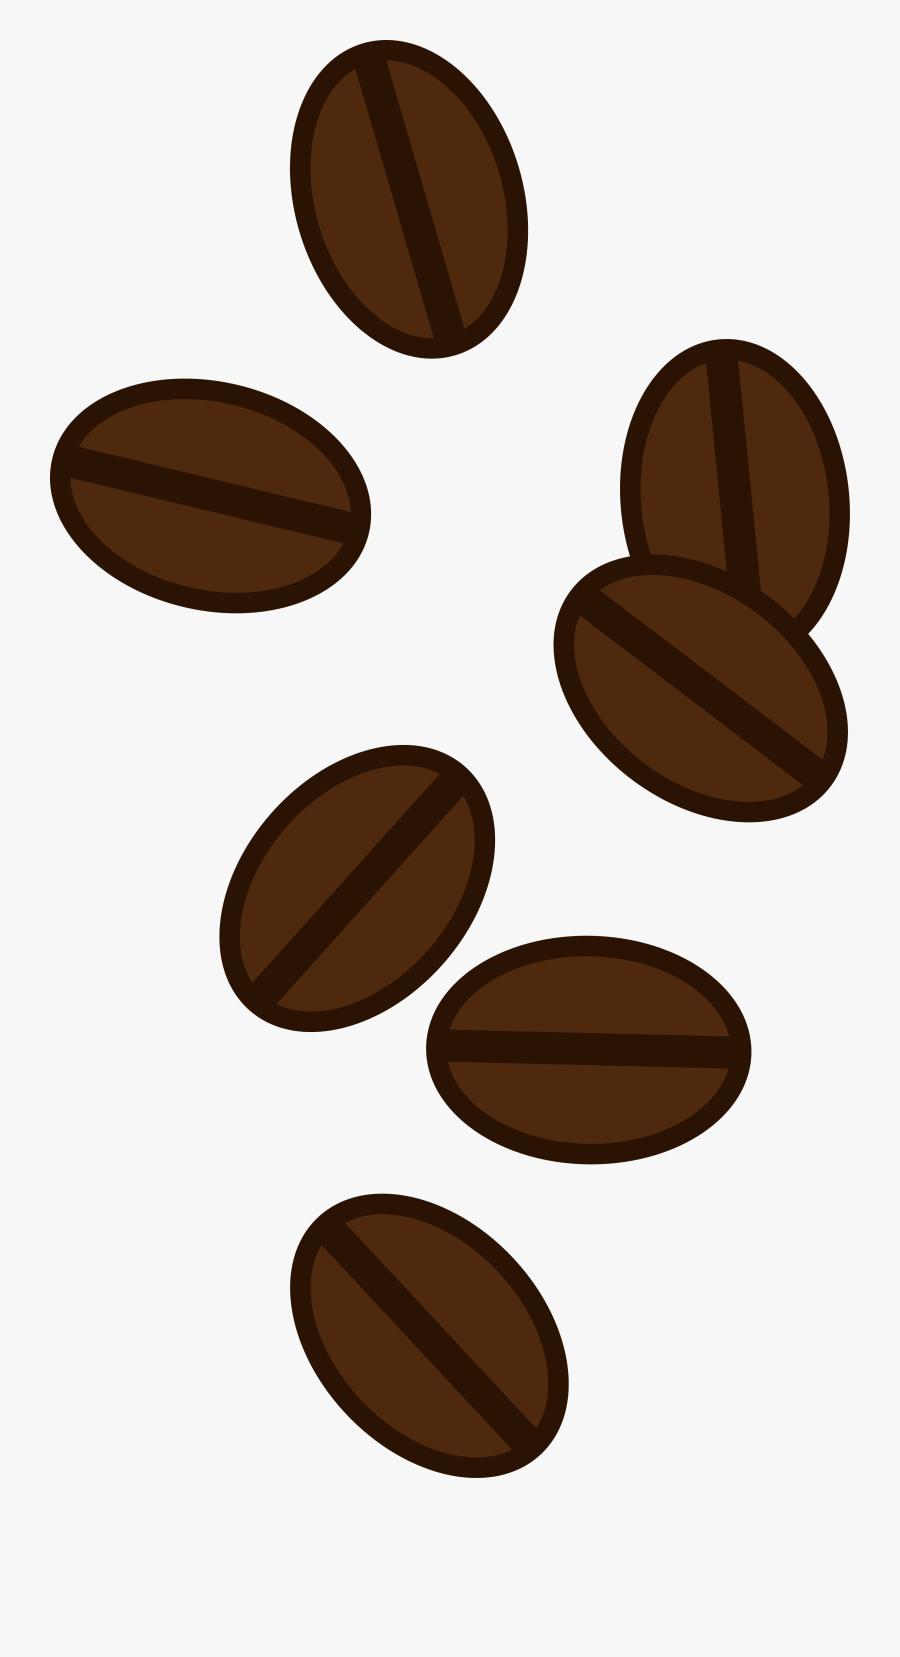 Thumb Image - Coffee Beans Clip Art, Transparent Clipart